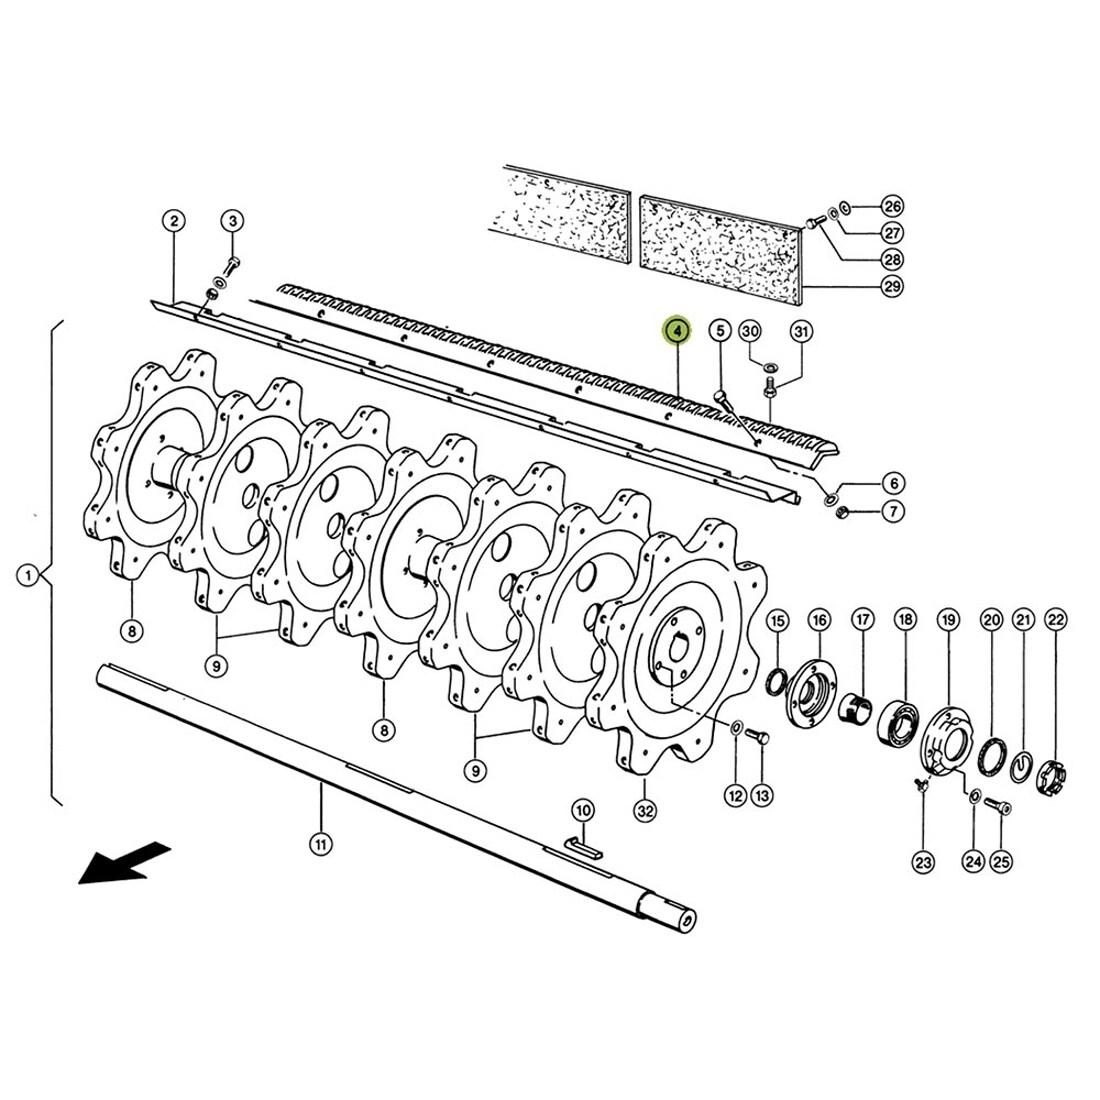 Rasp Bar / Beater Bar Set (LH+LH) for Claas combine